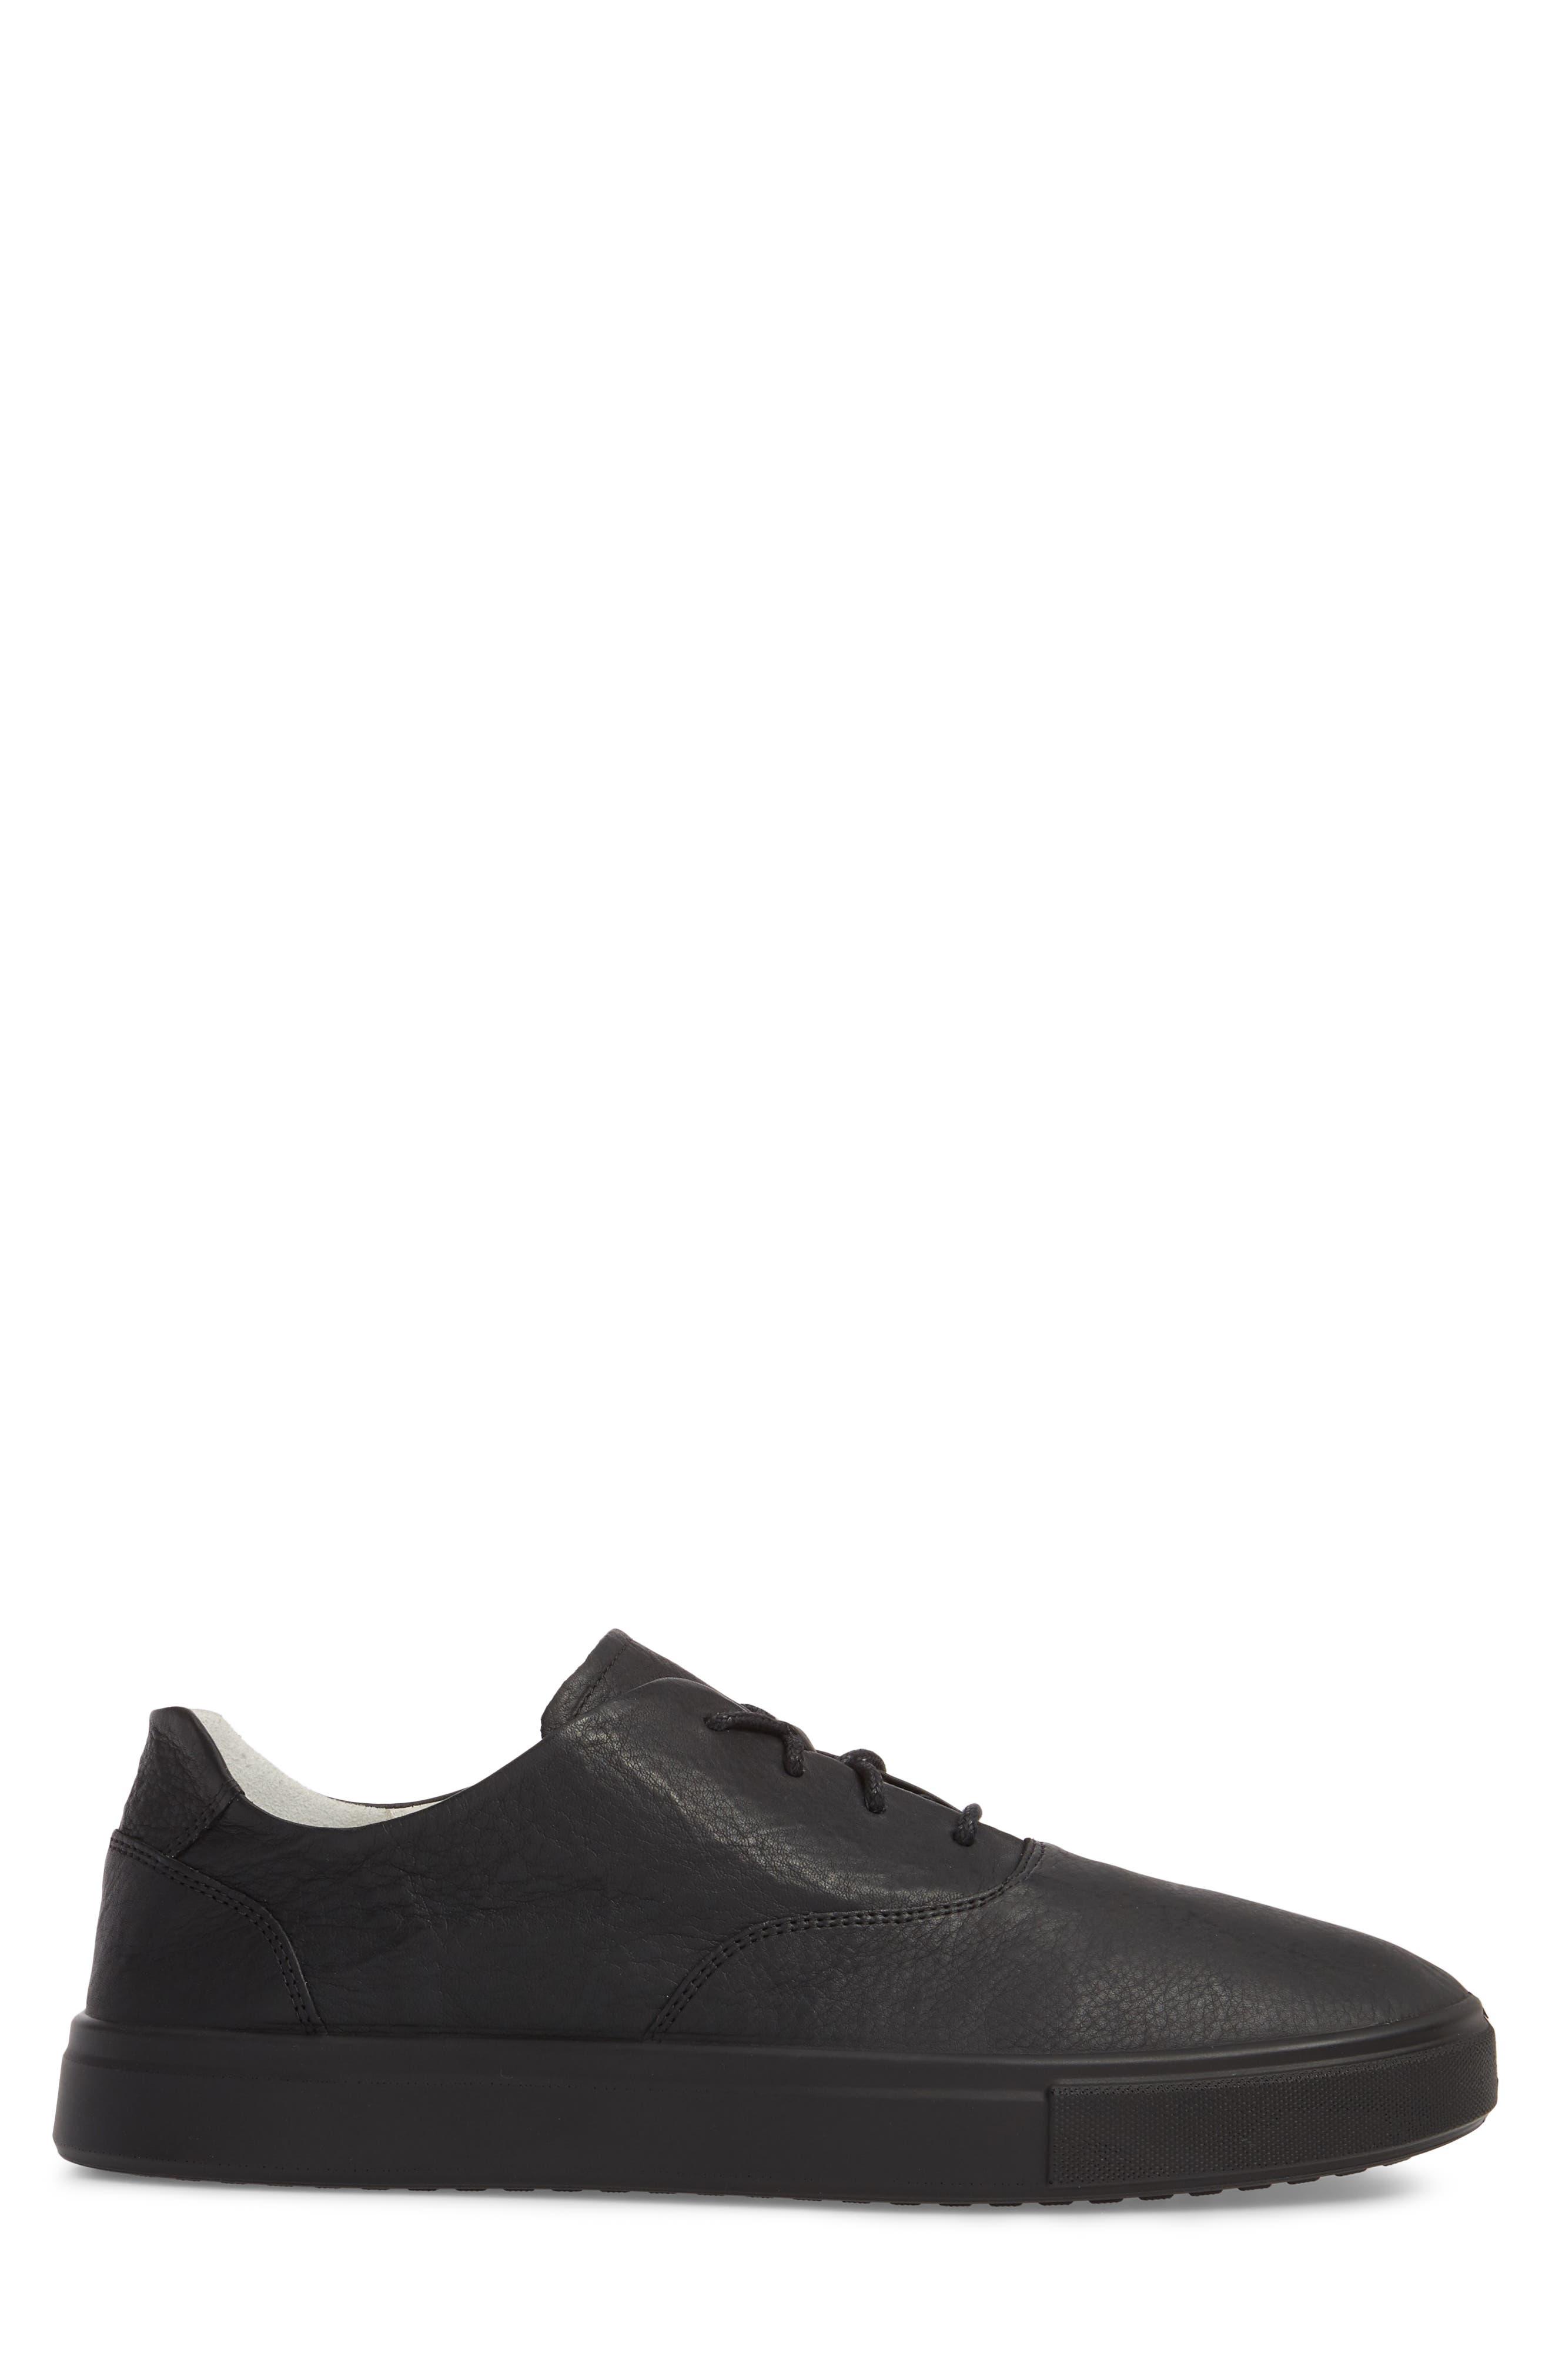 Kyle Low Top Sneaker,                             Alternate thumbnail 3, color,                             Rinsed Black Leather